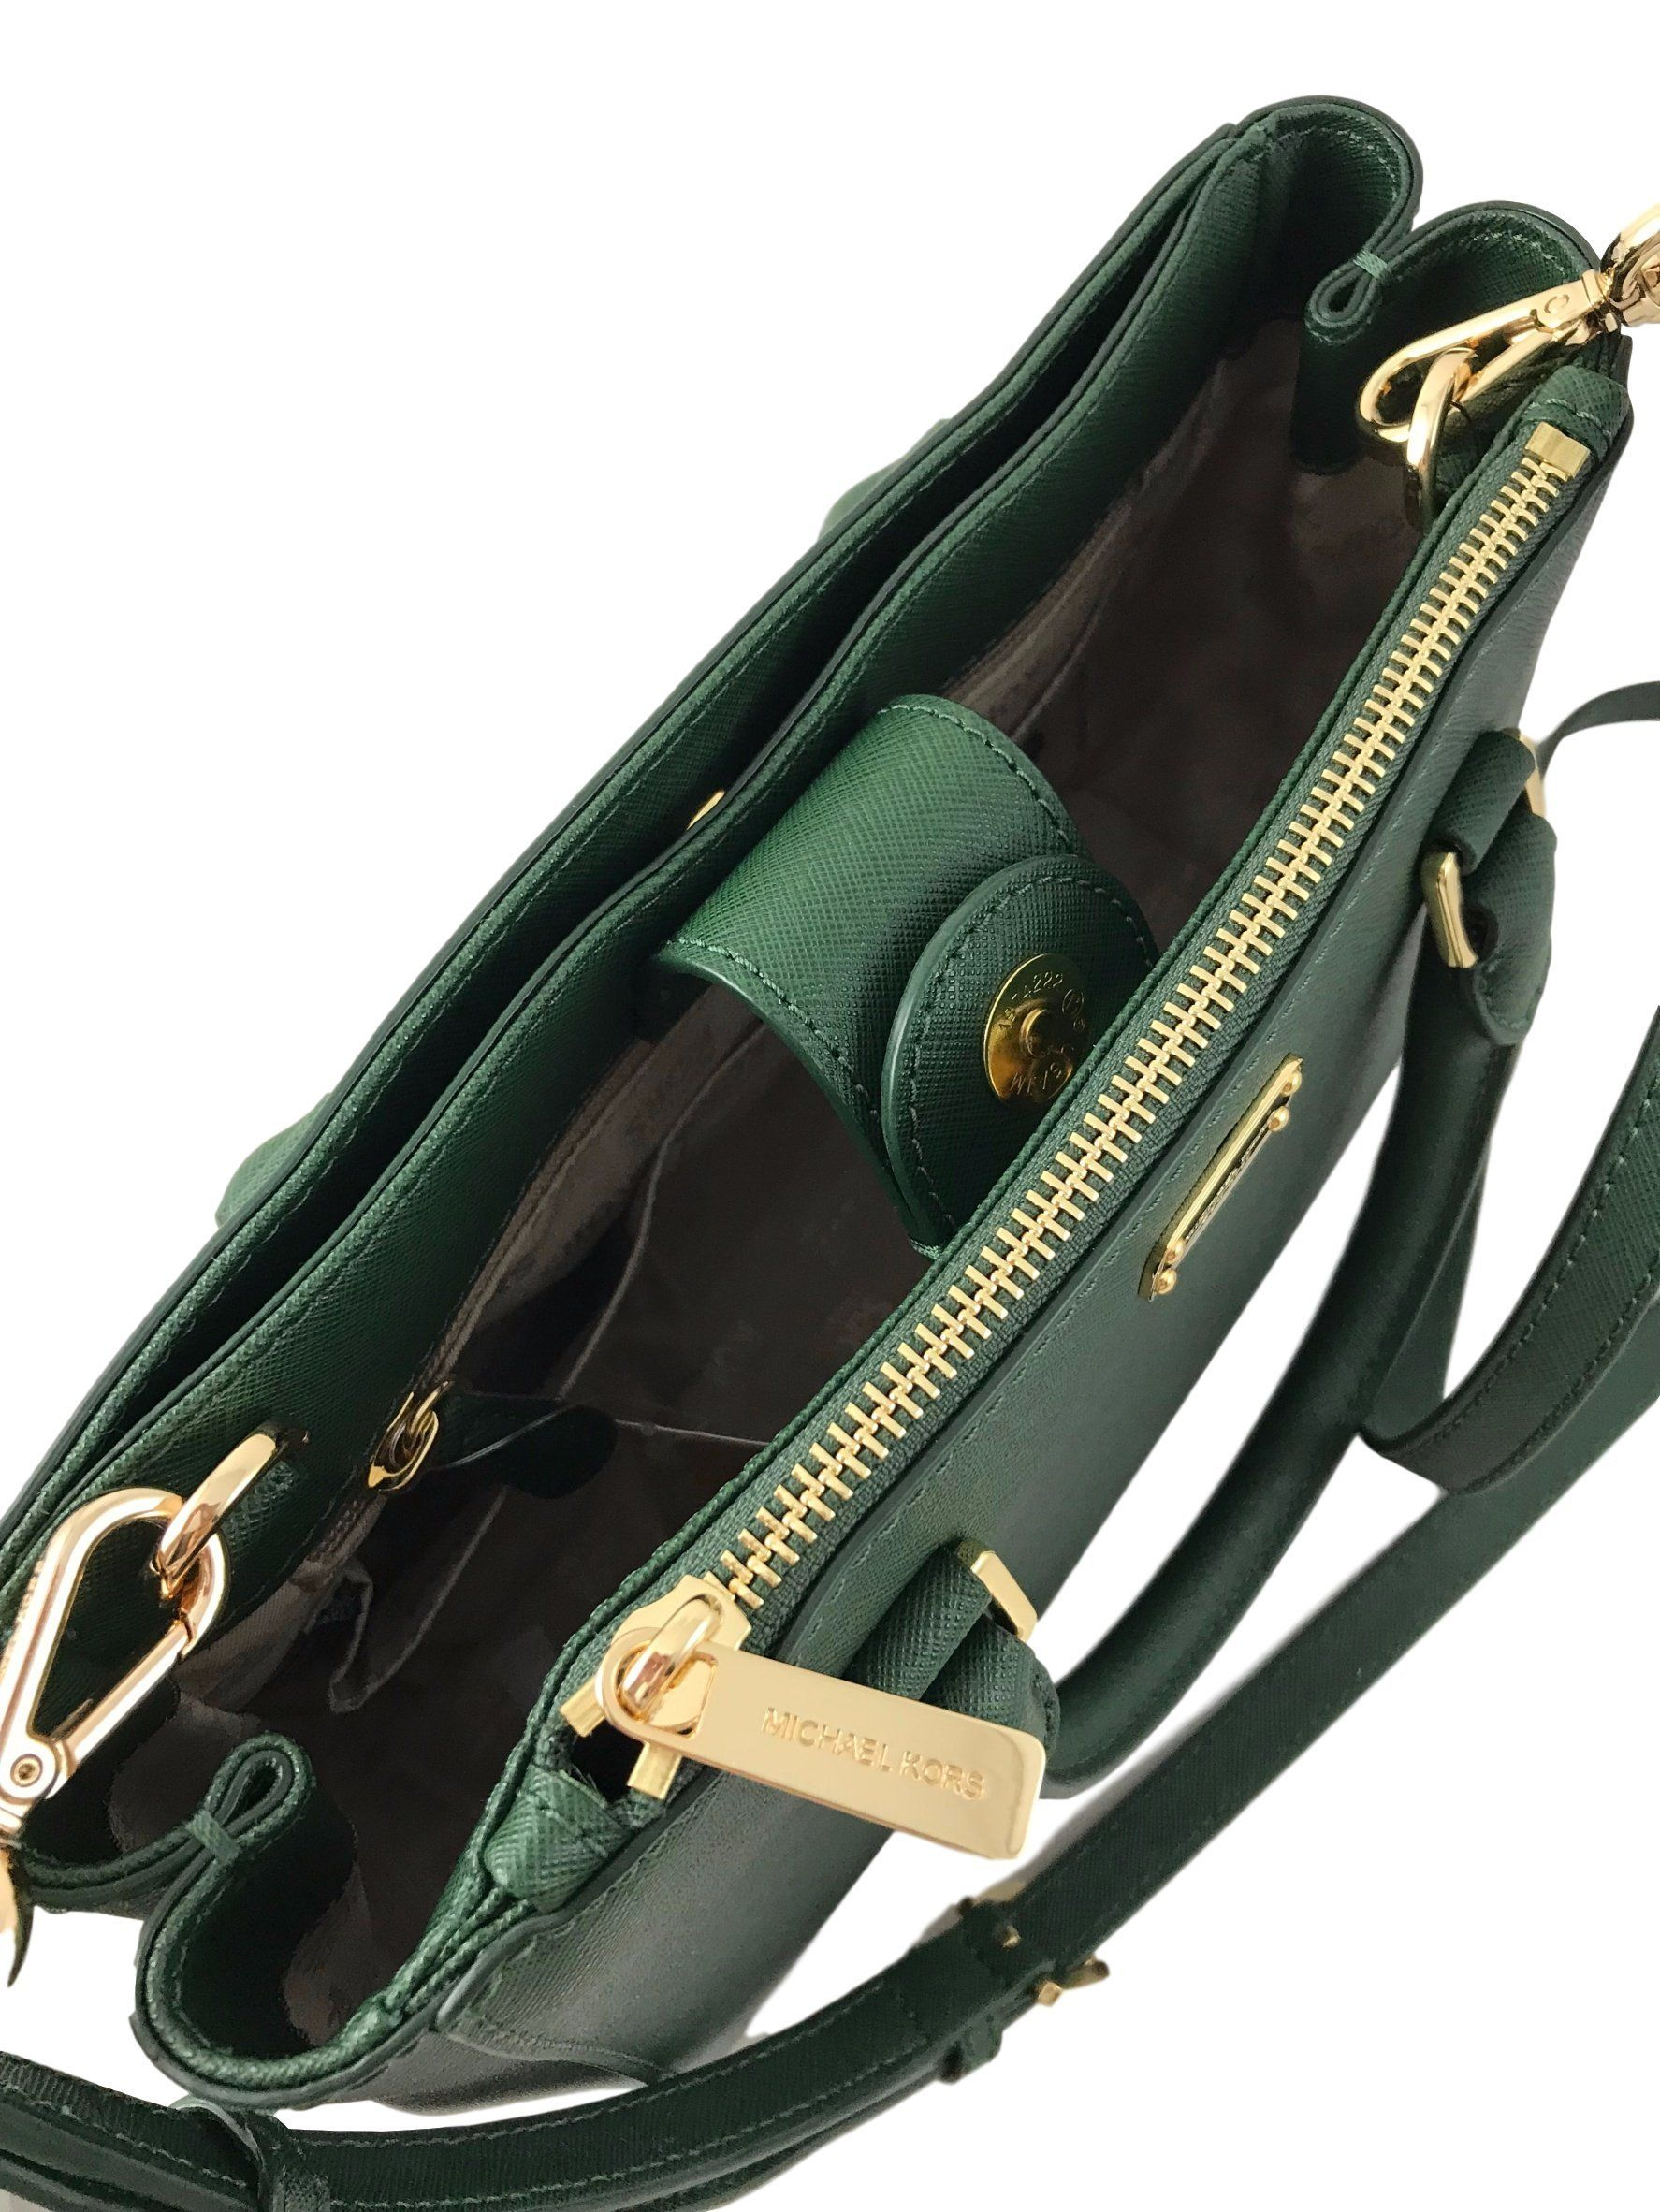 6ef00cd612 MICHAEL KORS Kellen XS Saffiano Leather Satchel Bag in Moss Green -- You  can get